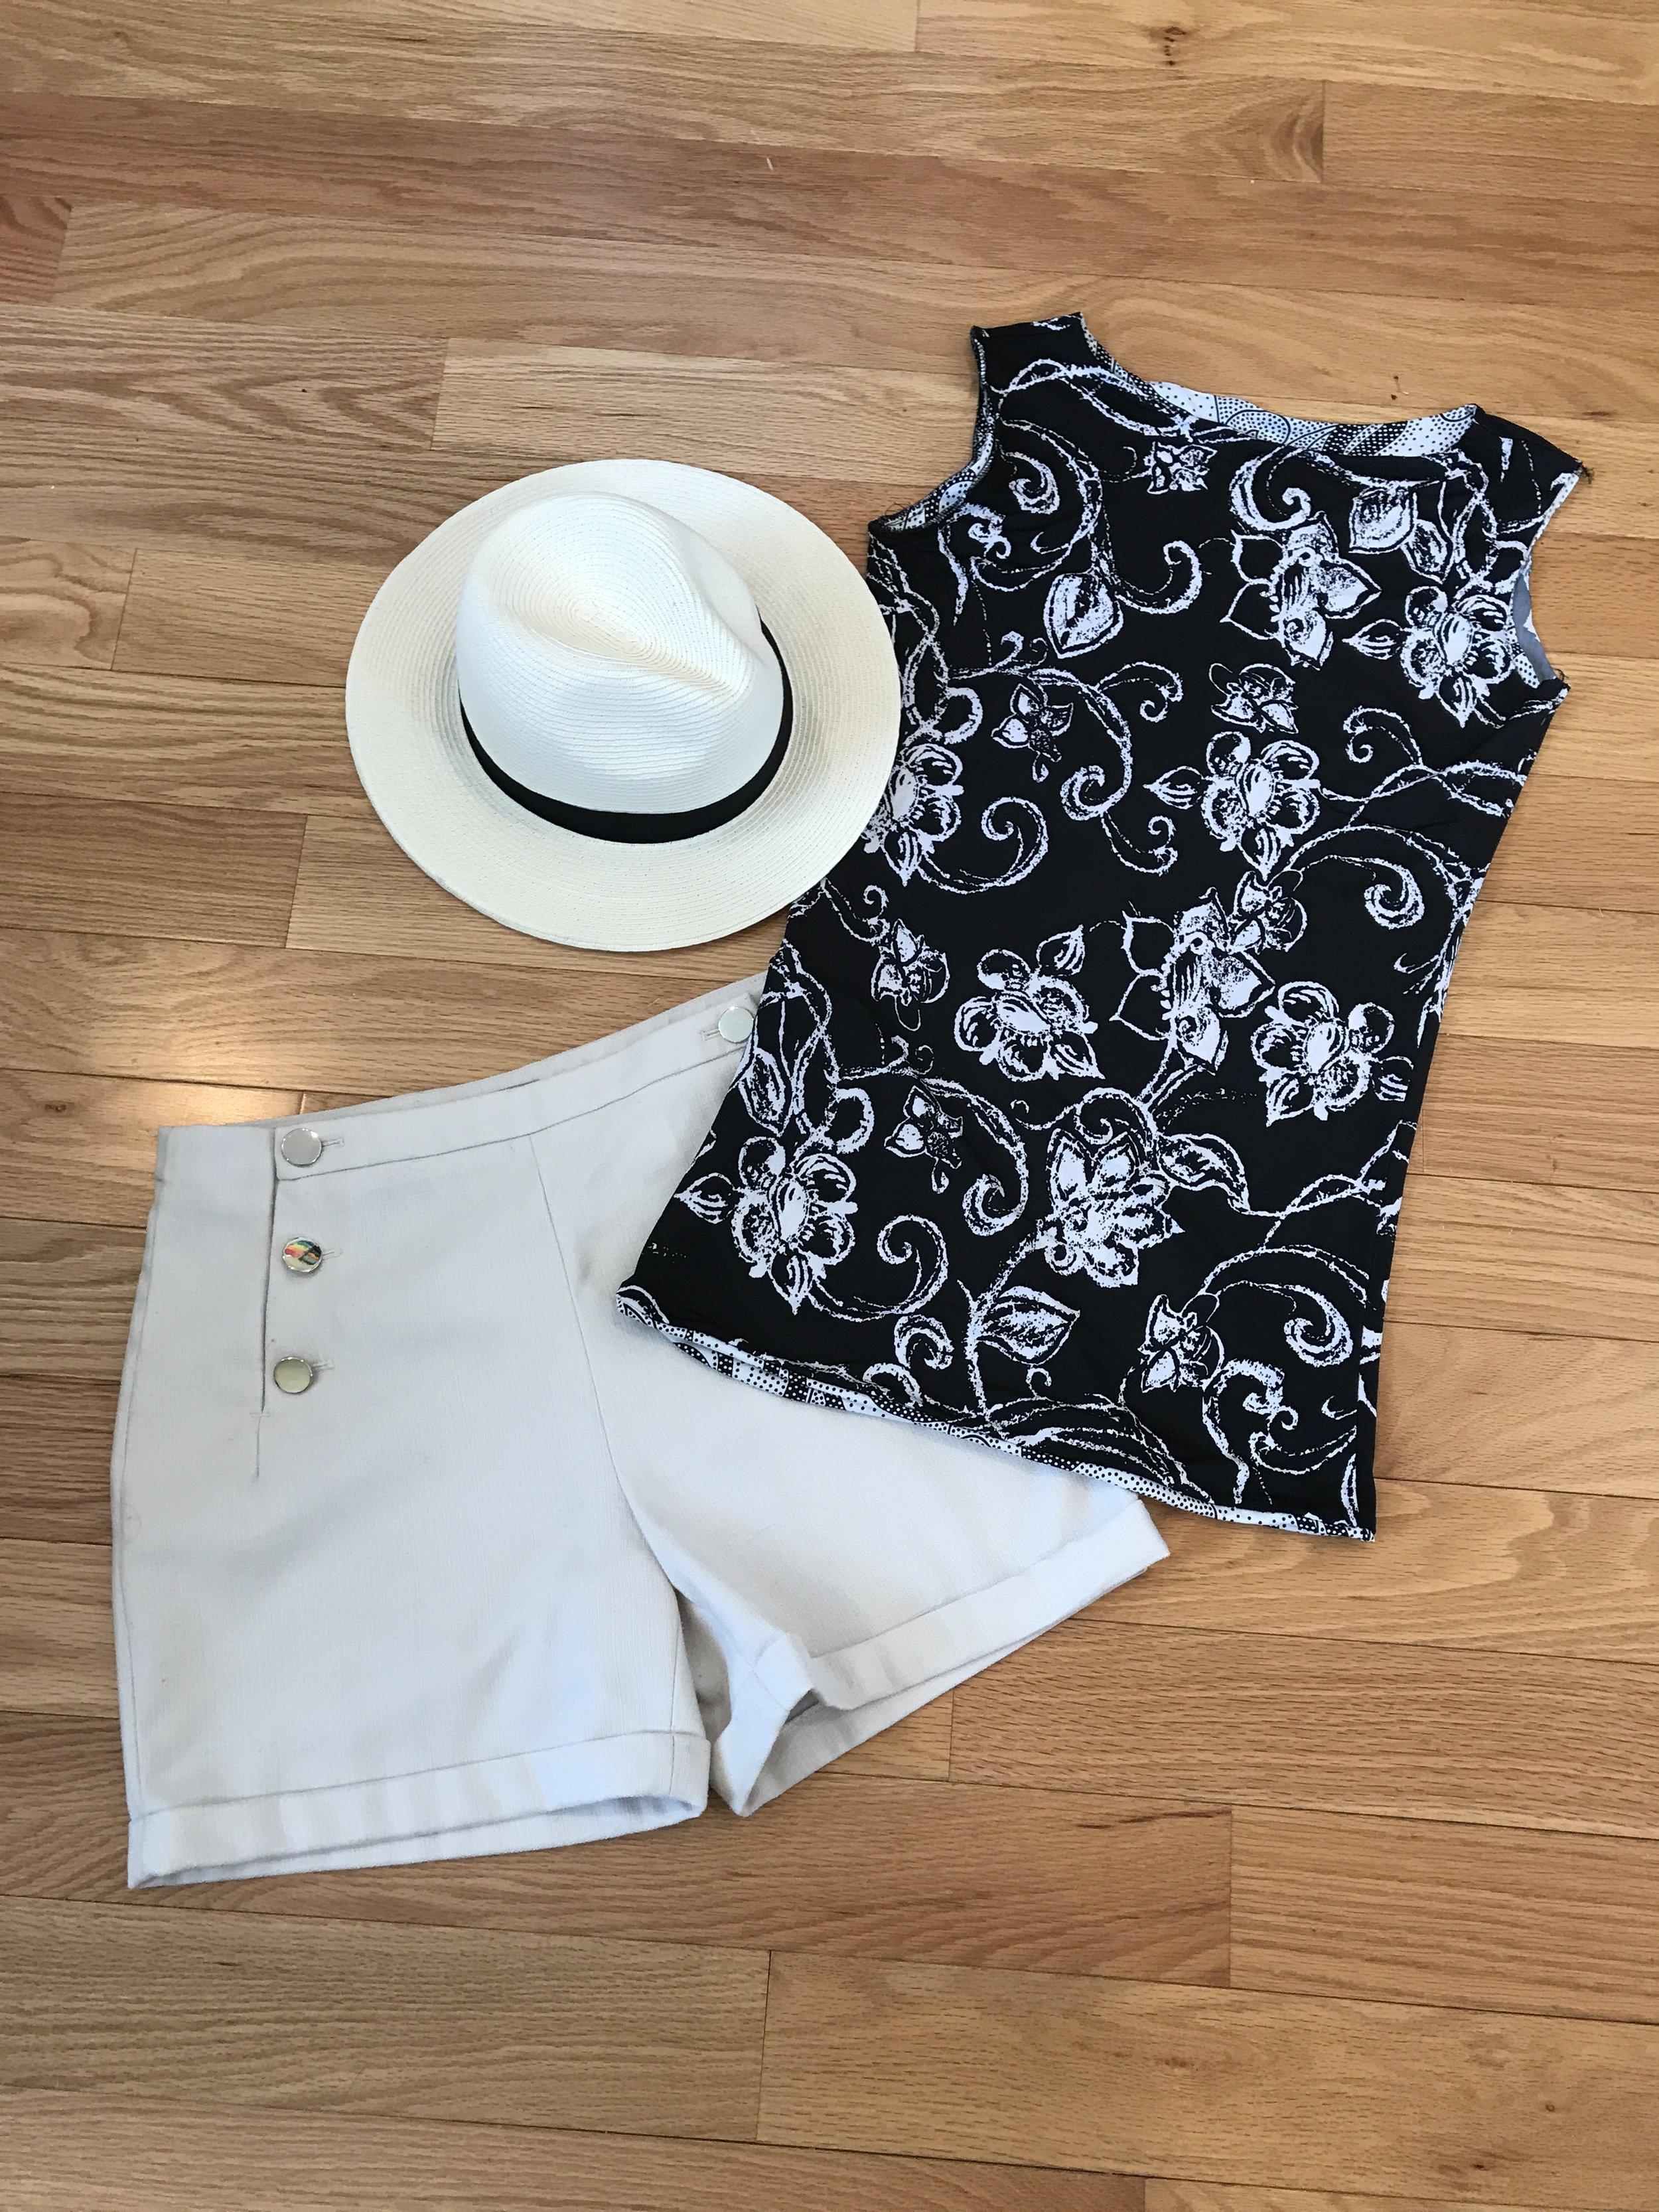 Sewing a Spring Break Capsule Wardrobe with Christine Jonson Patterns   tee shirts